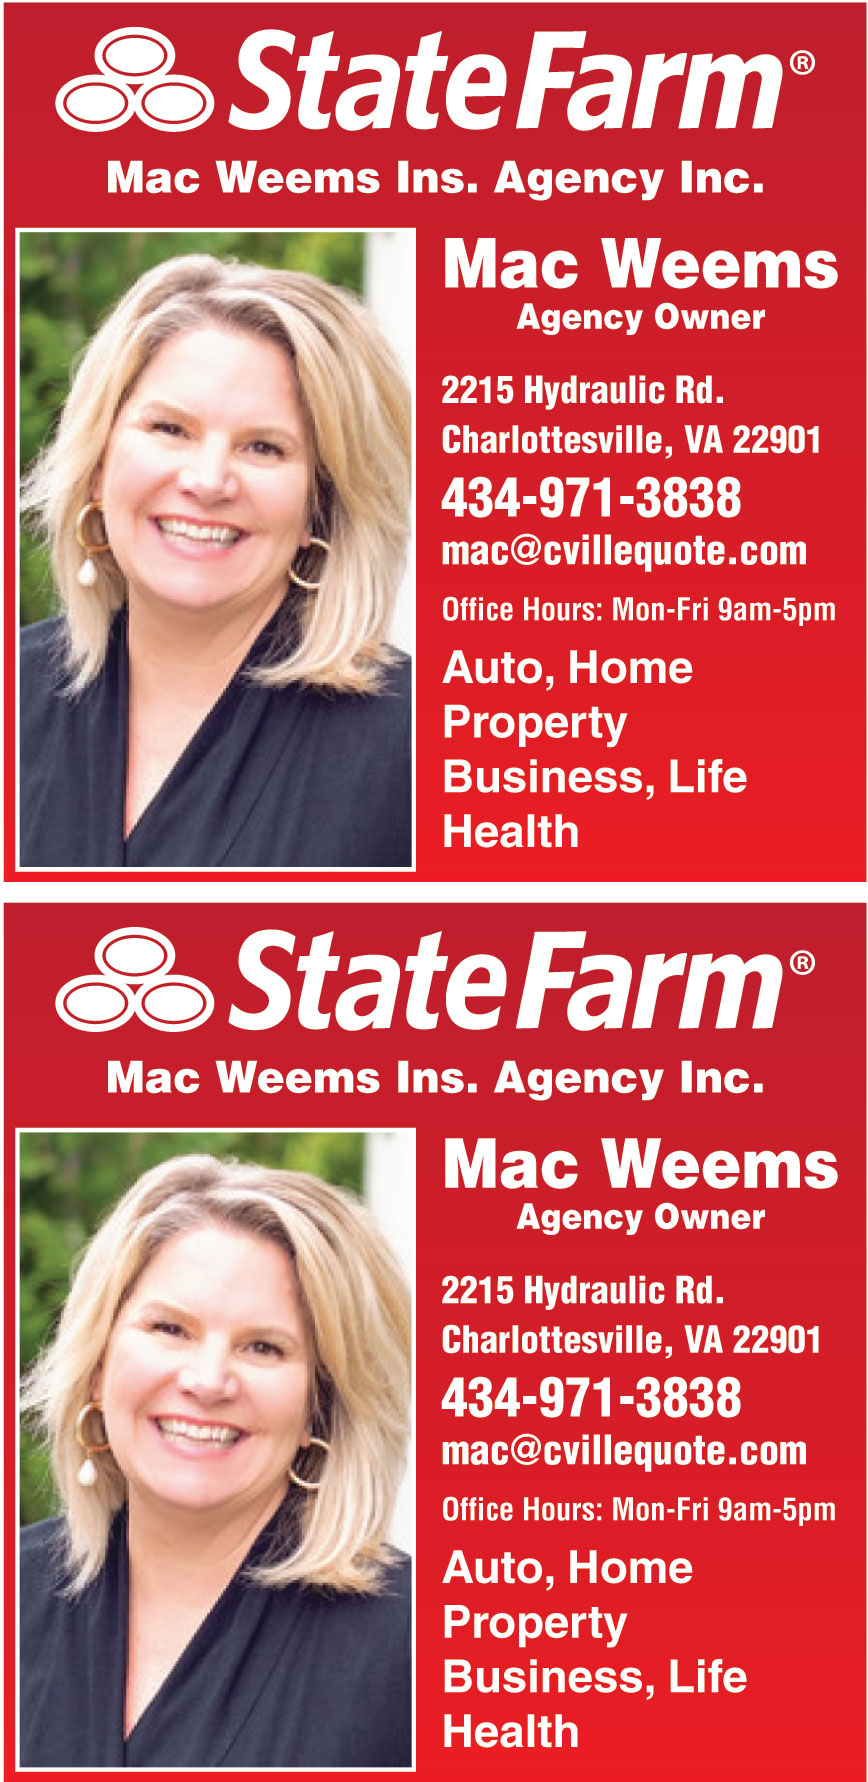 STATE FARM MAC WEEMS